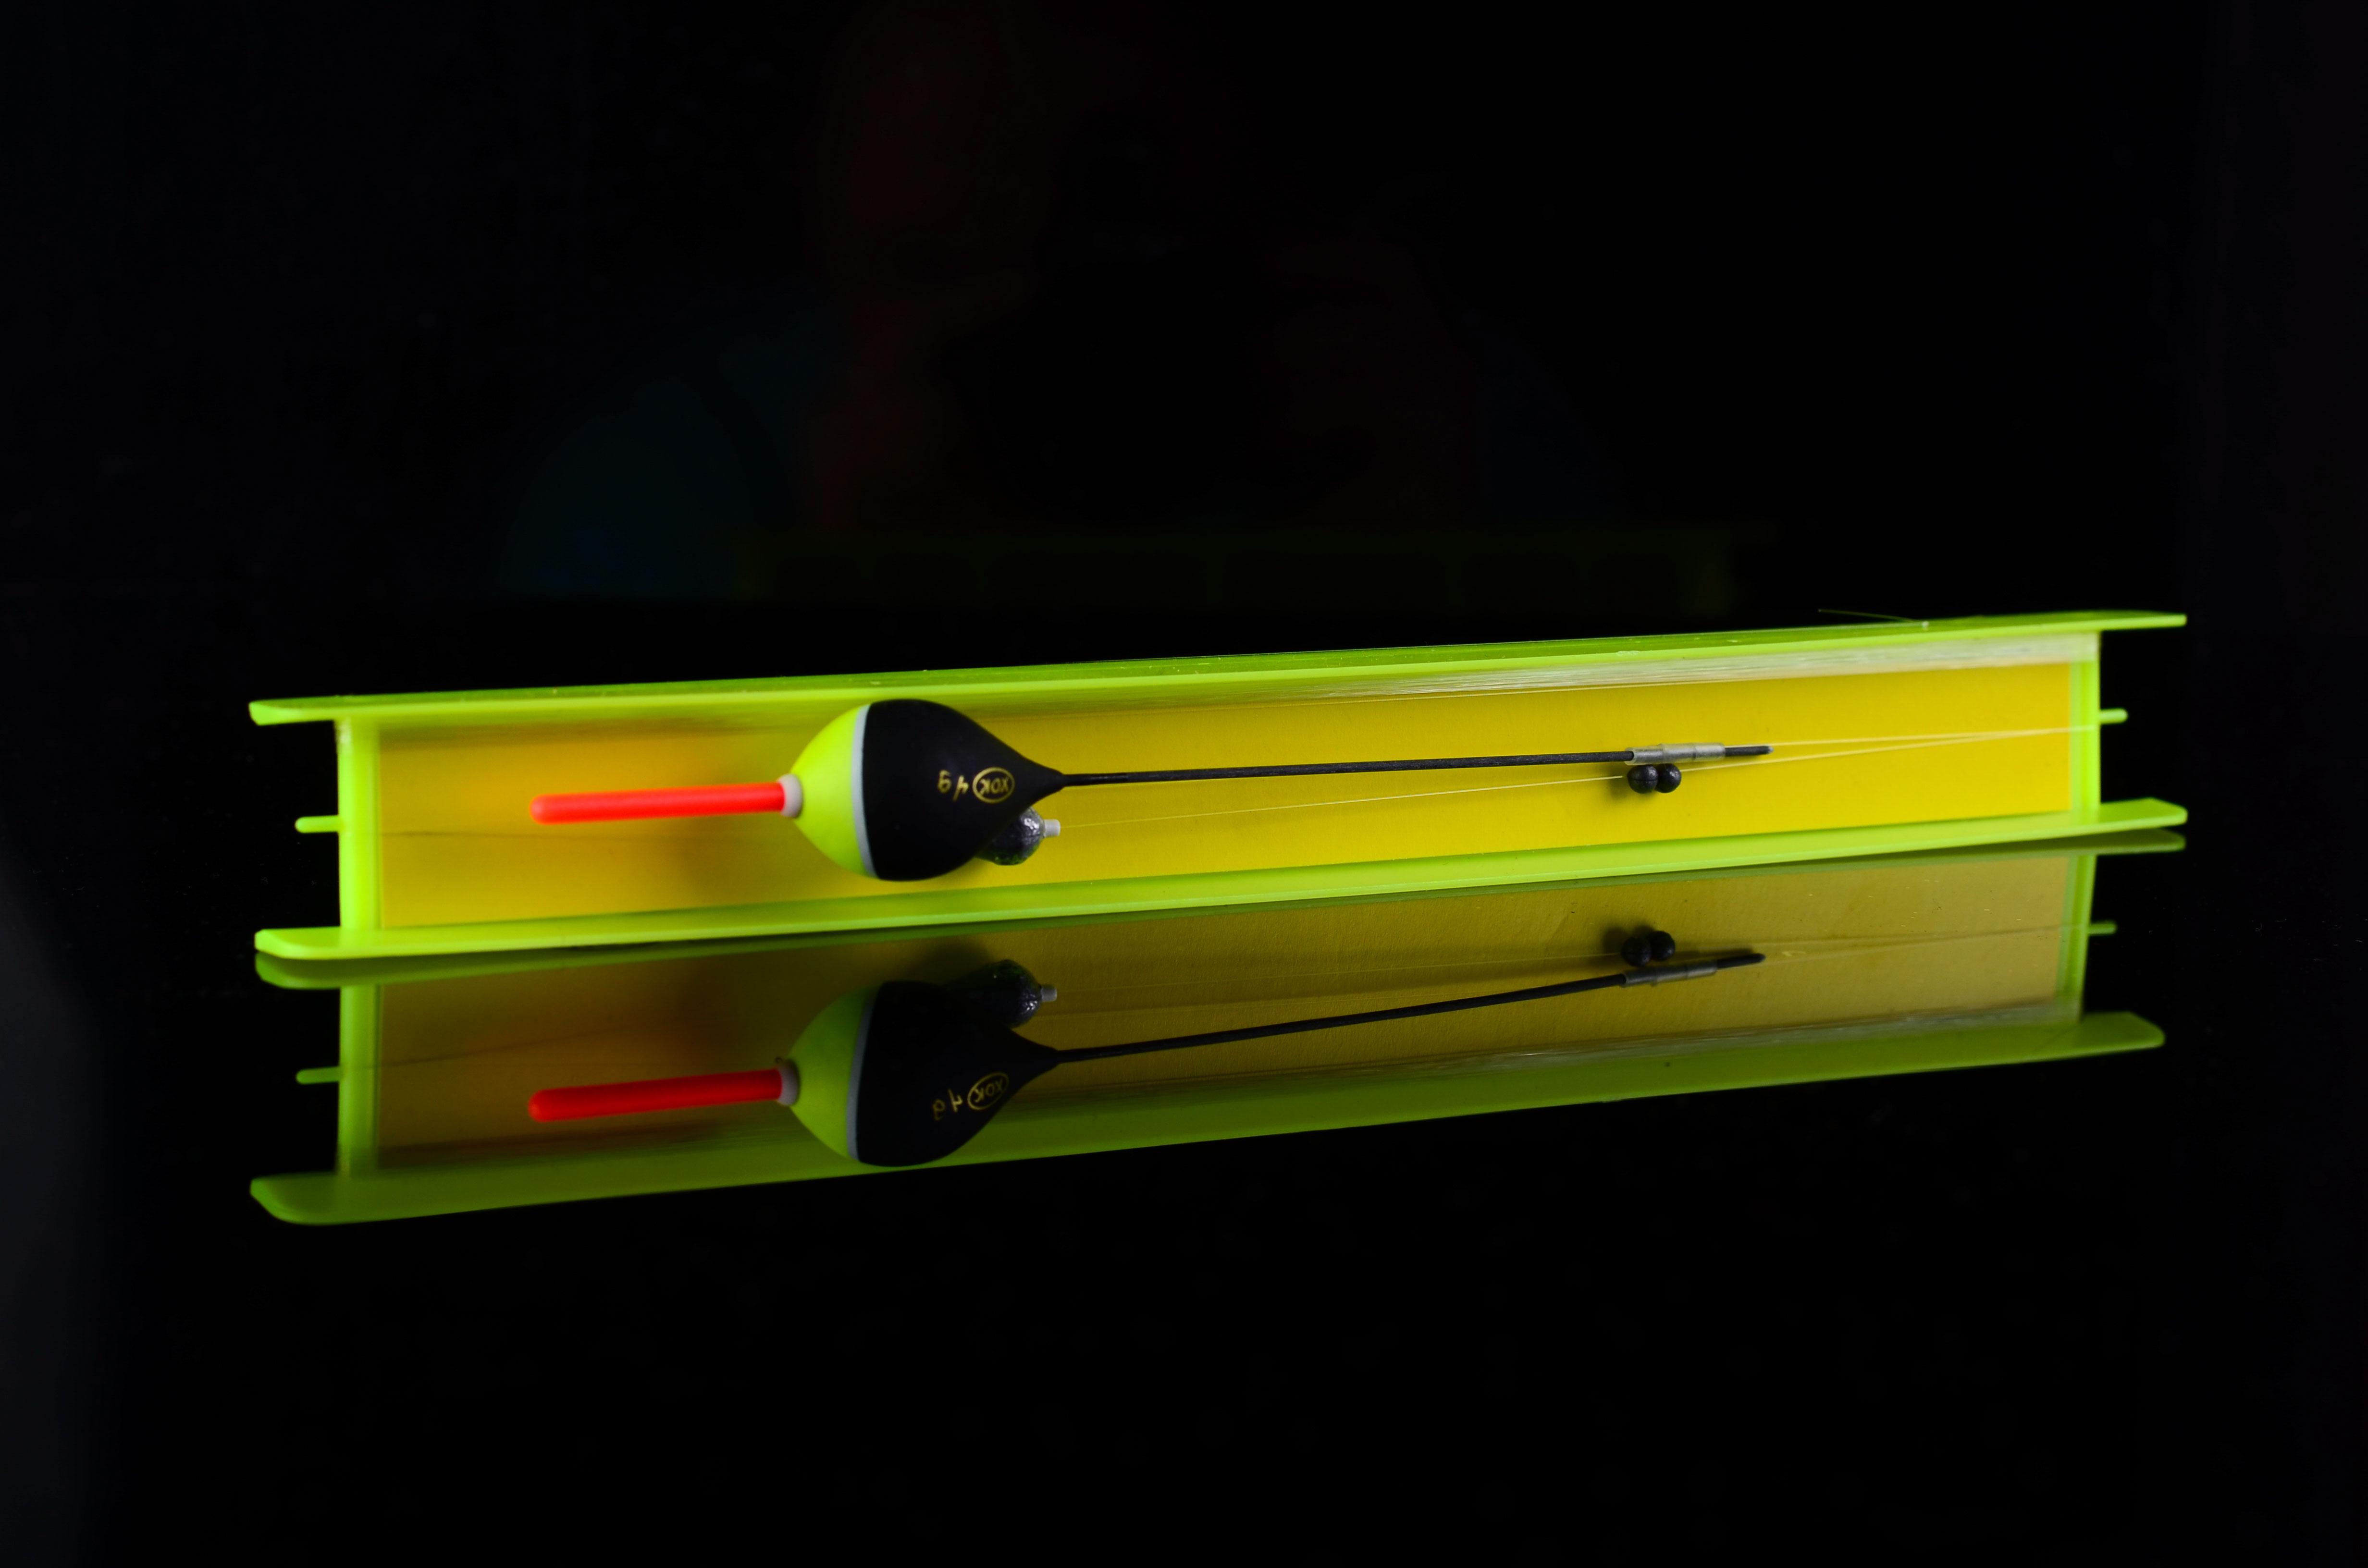 Остнастка 11400-Z 5 гр. леска 0,14*20м крючок №14 cannelle 5шт